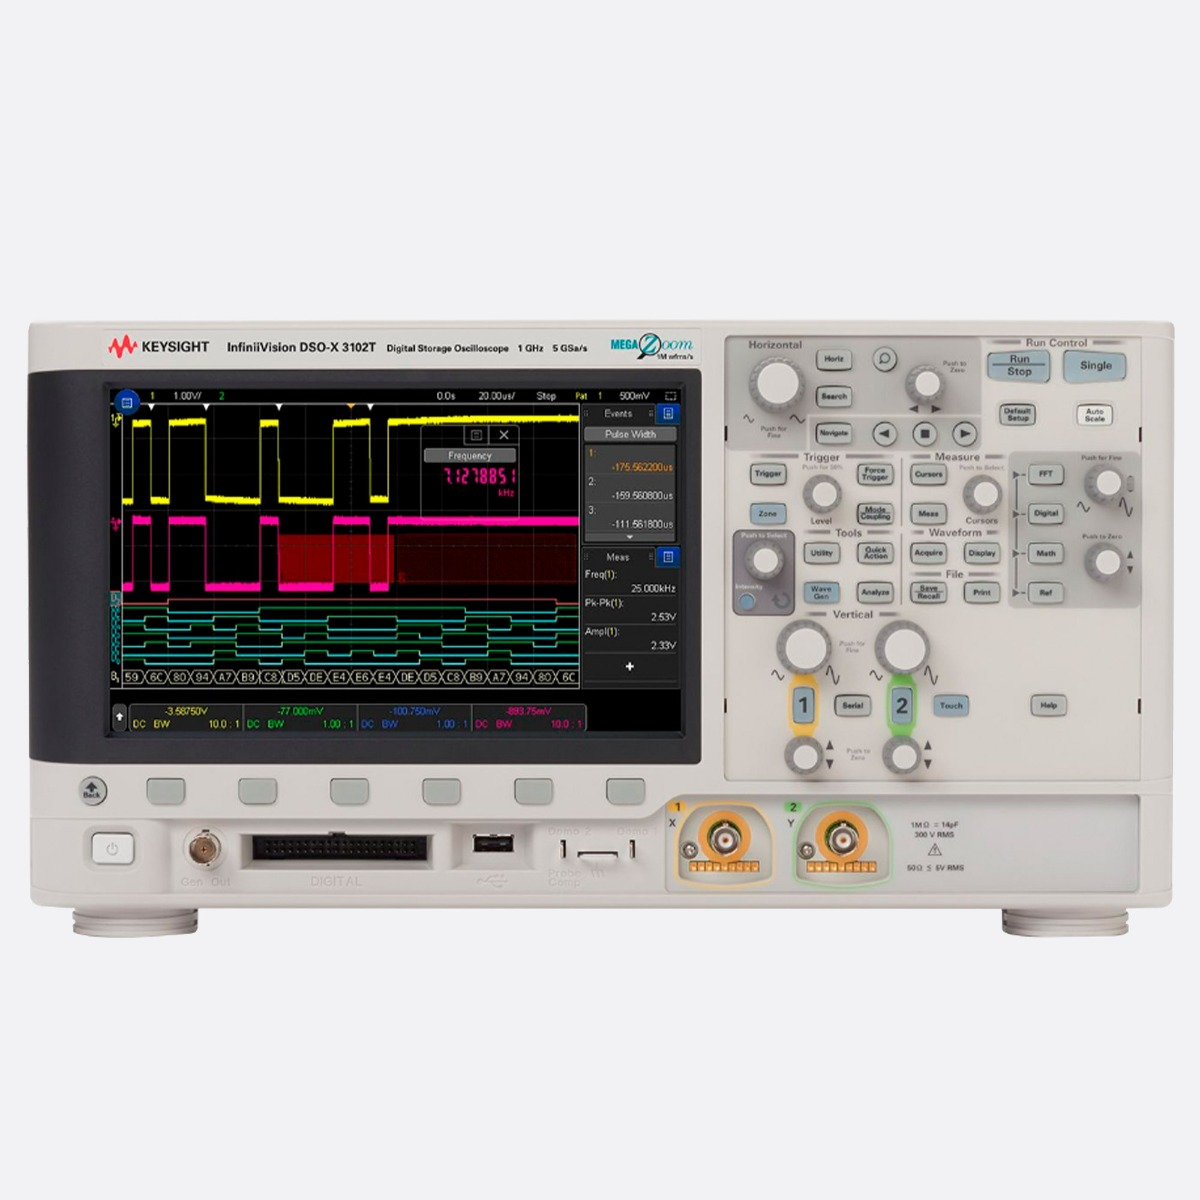 Keysight_DSOX3102T_Front_Ccontrols